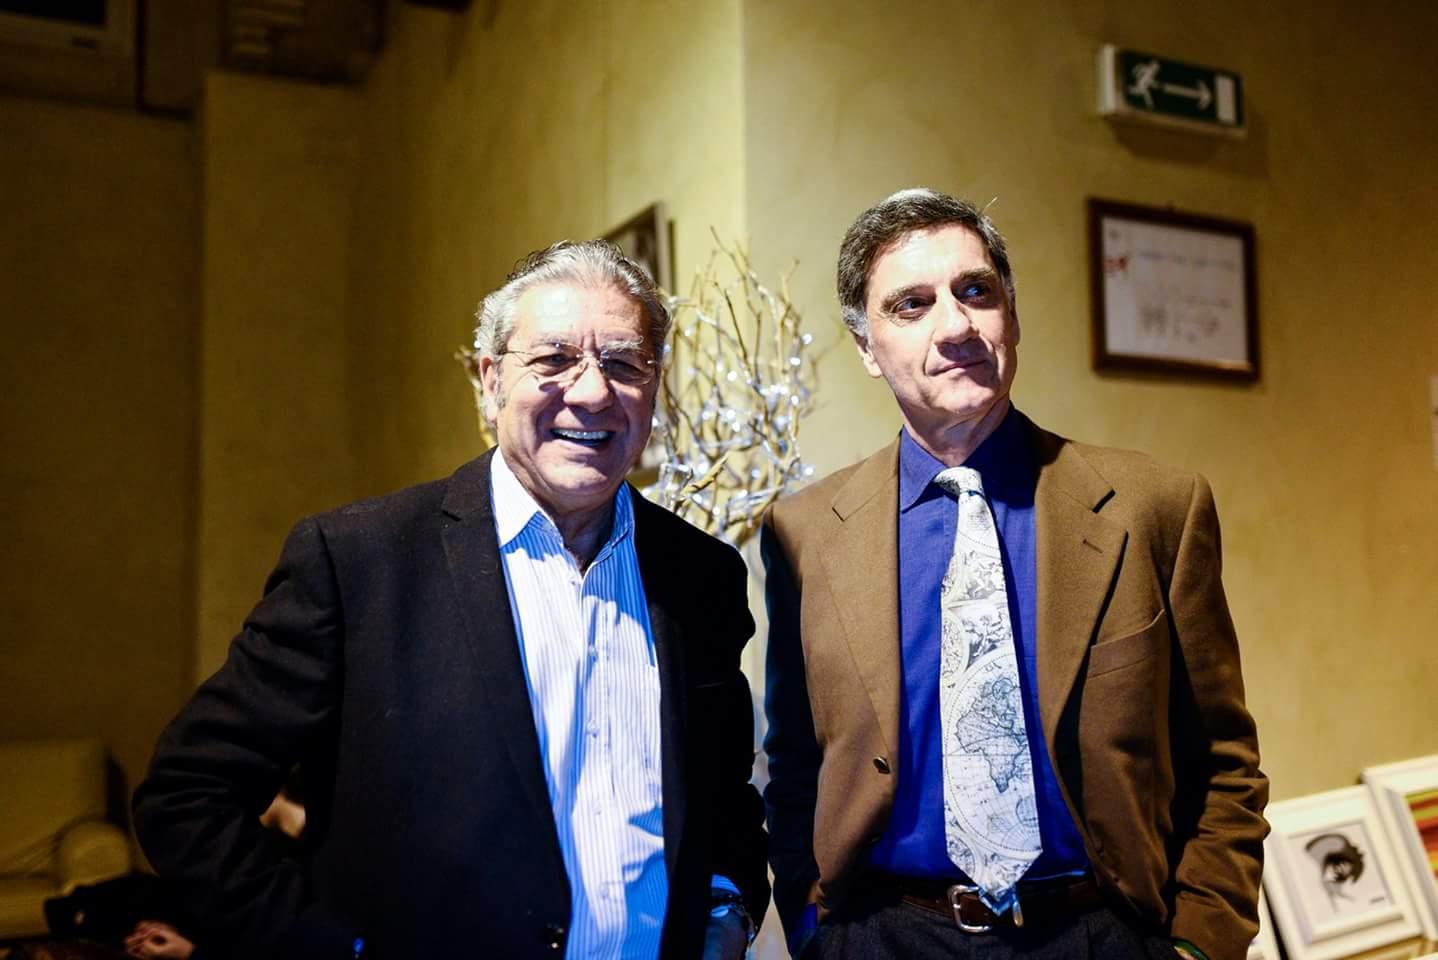 Franco Micalizzi e Marco Tullio Barboni